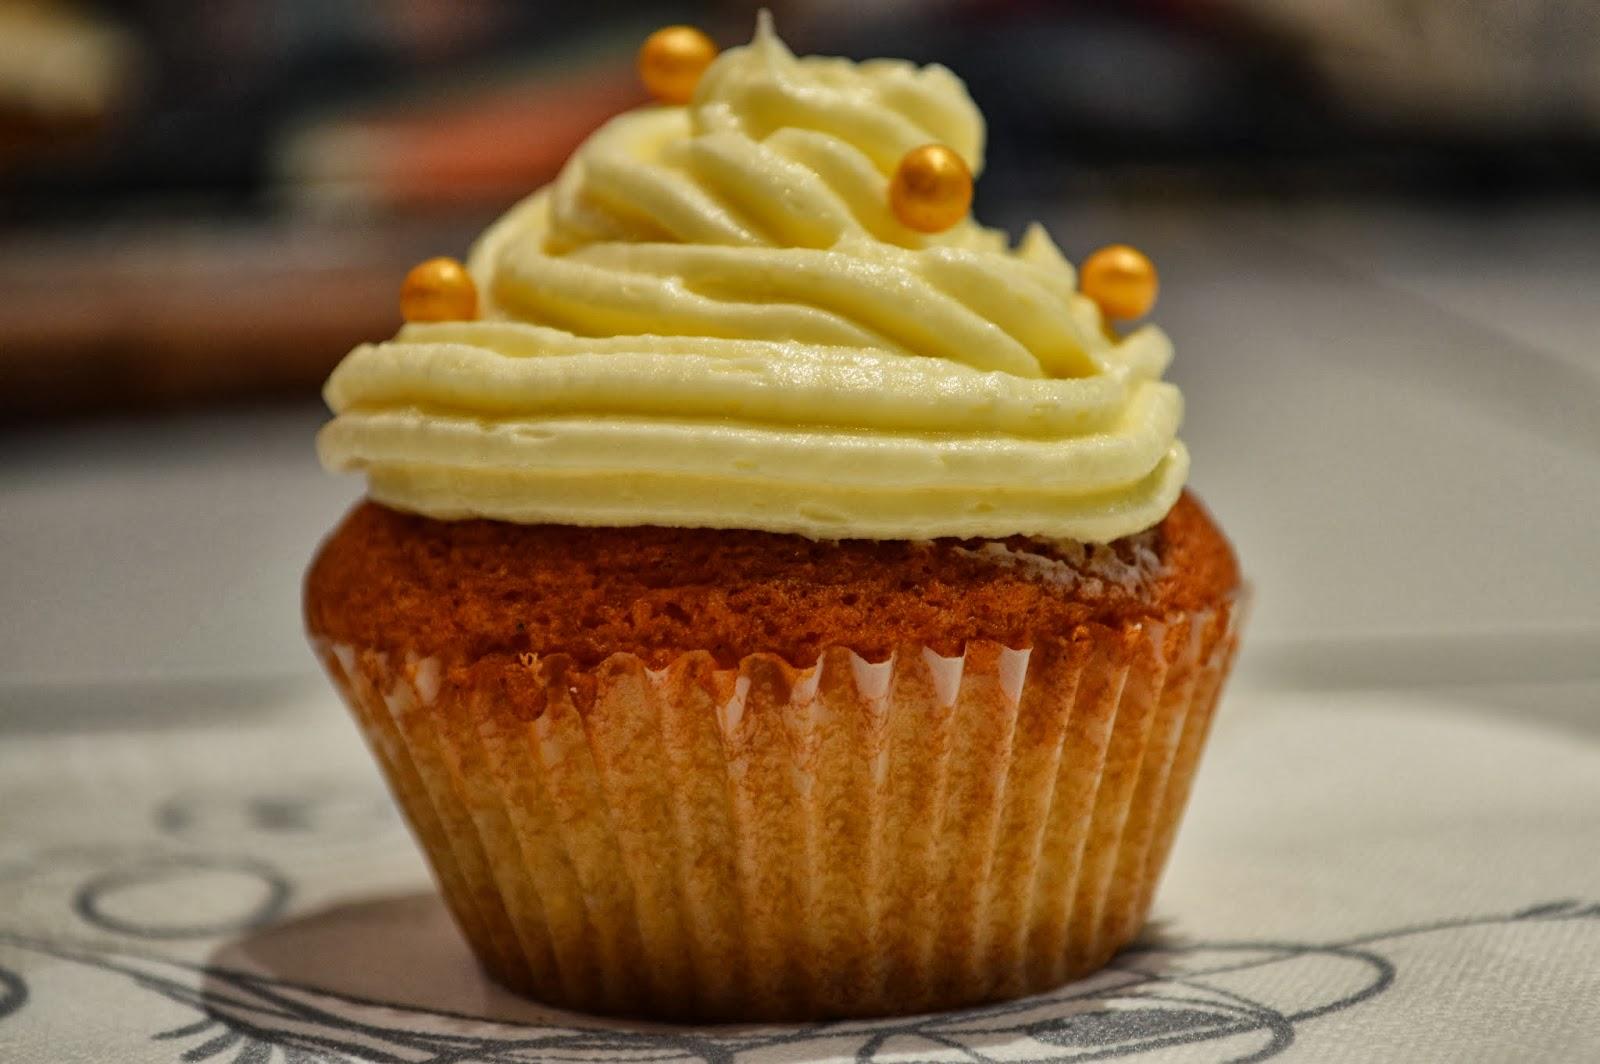 Lemon Cup cake